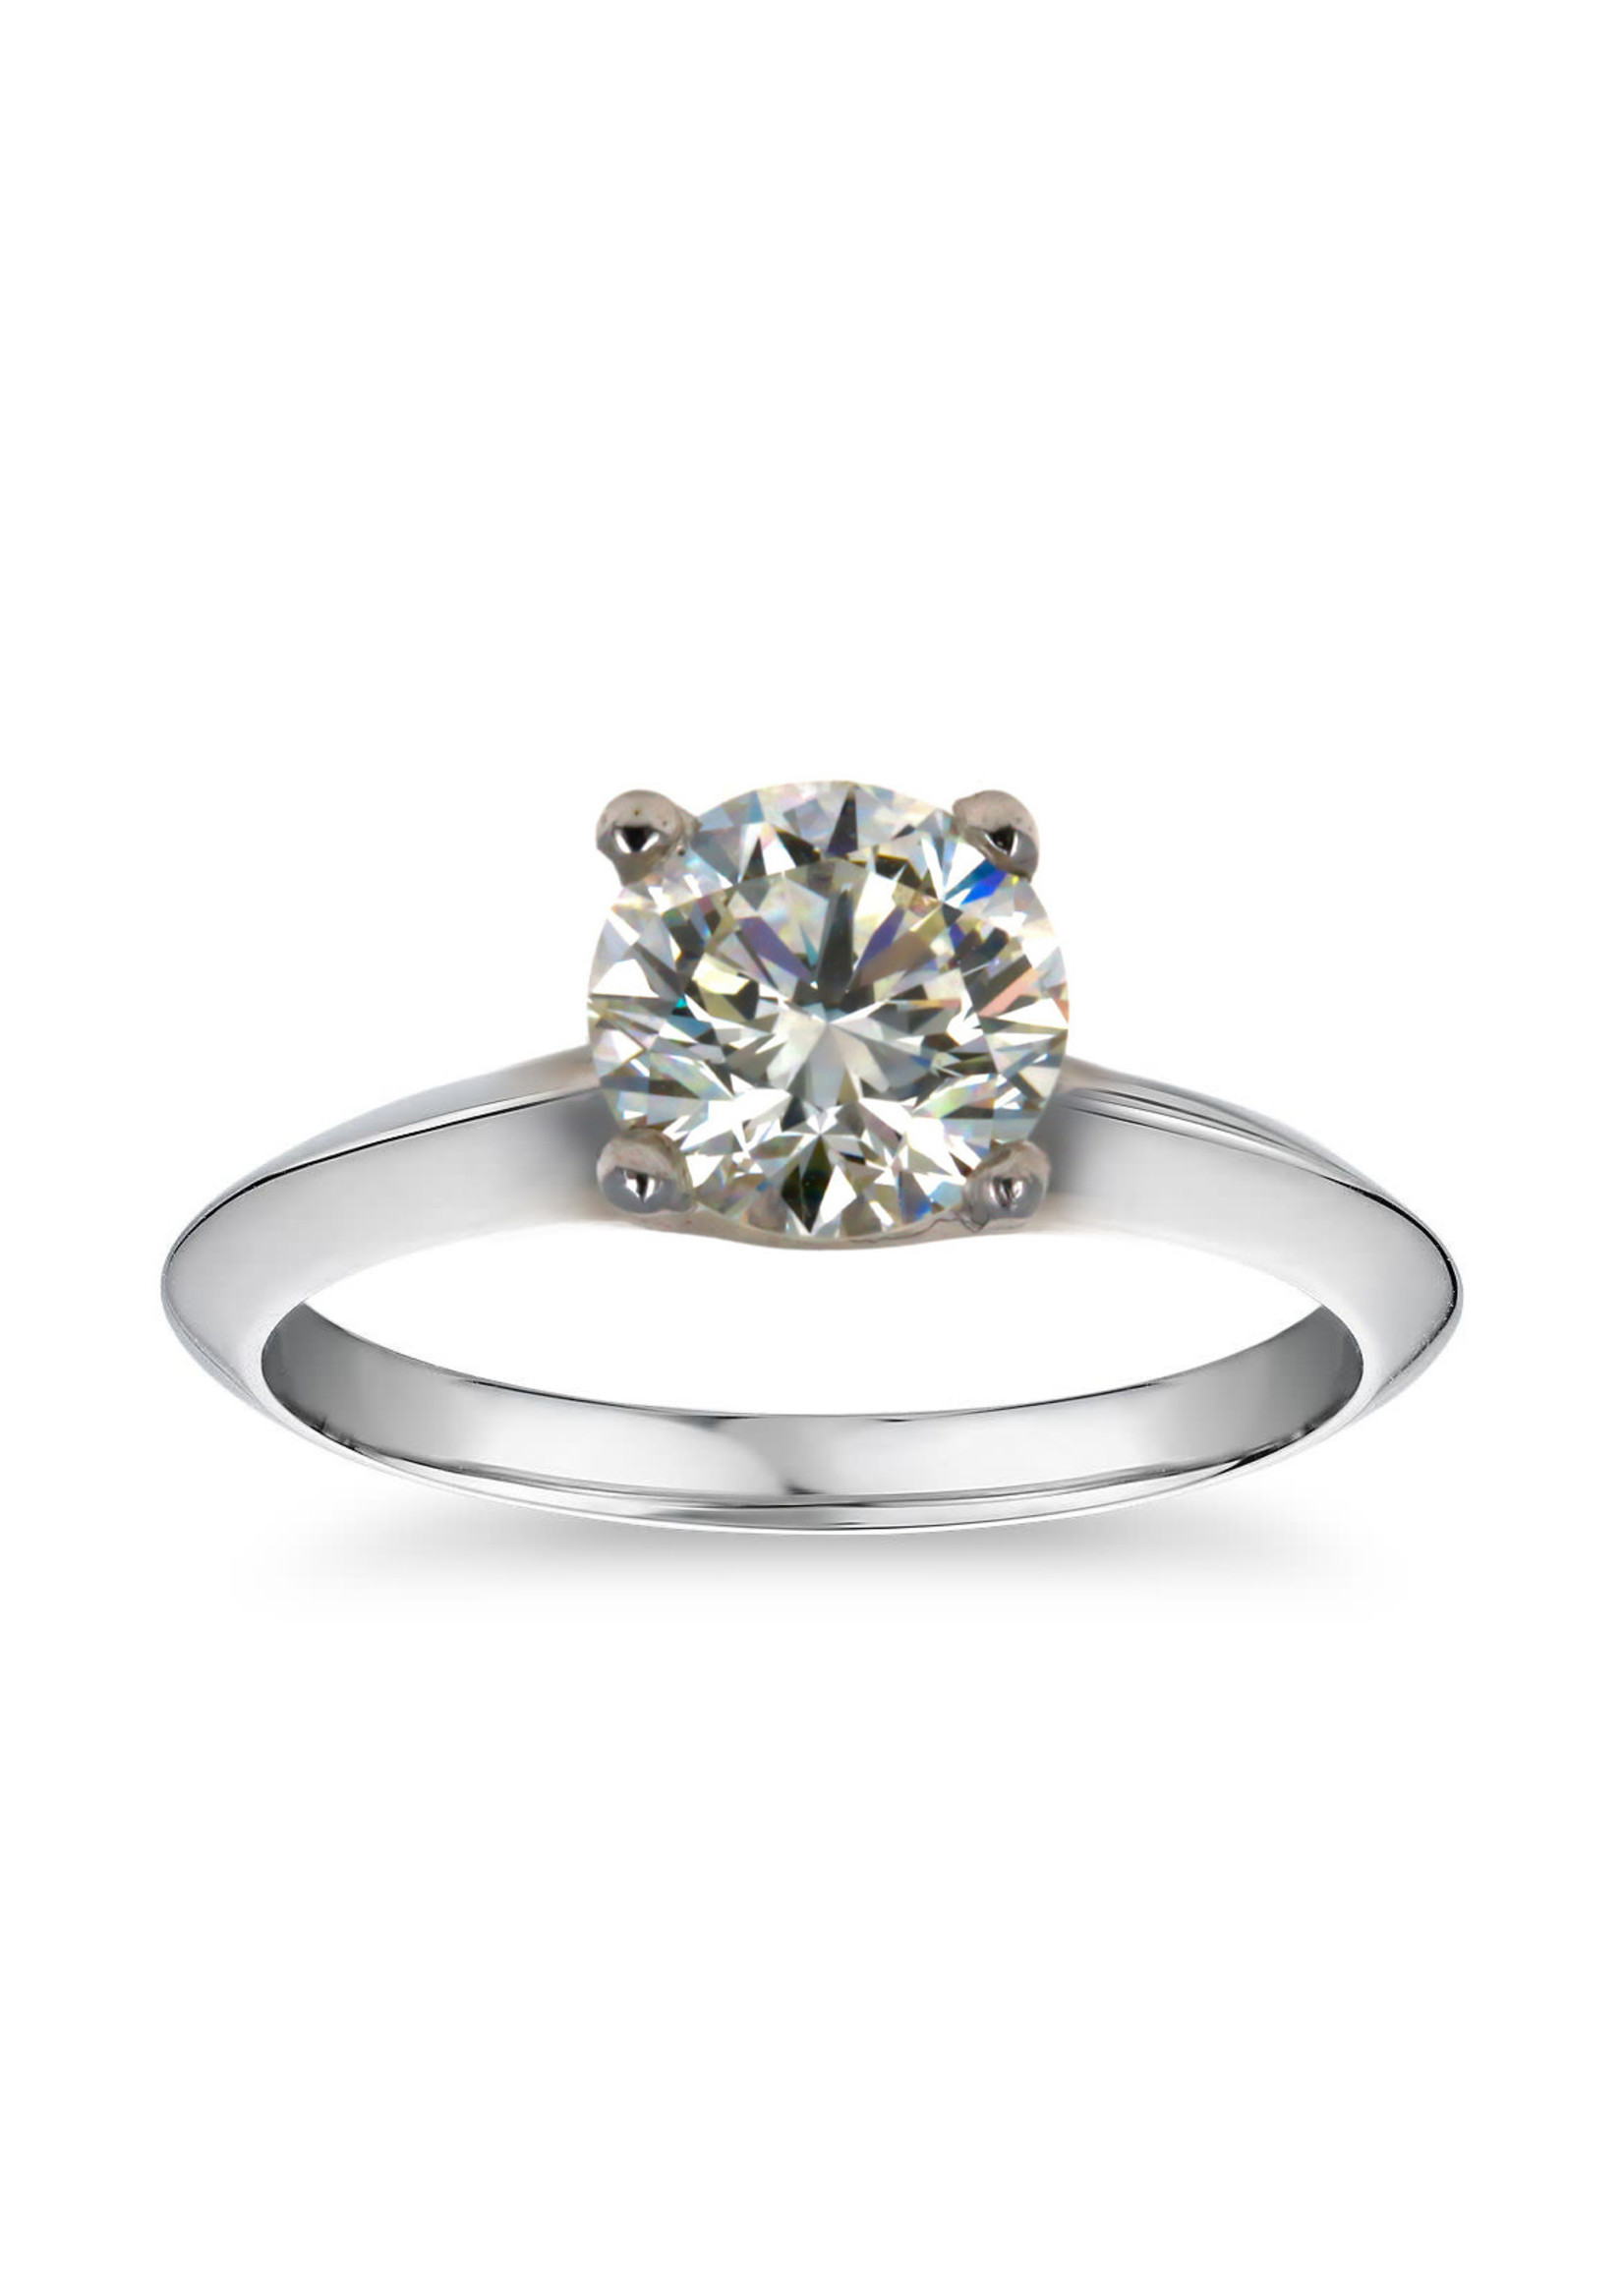 Jewellery 1.71 CT SOLITAIRE DIAMOND PLATINUM RING - VS-1/ J / EXCELLENT